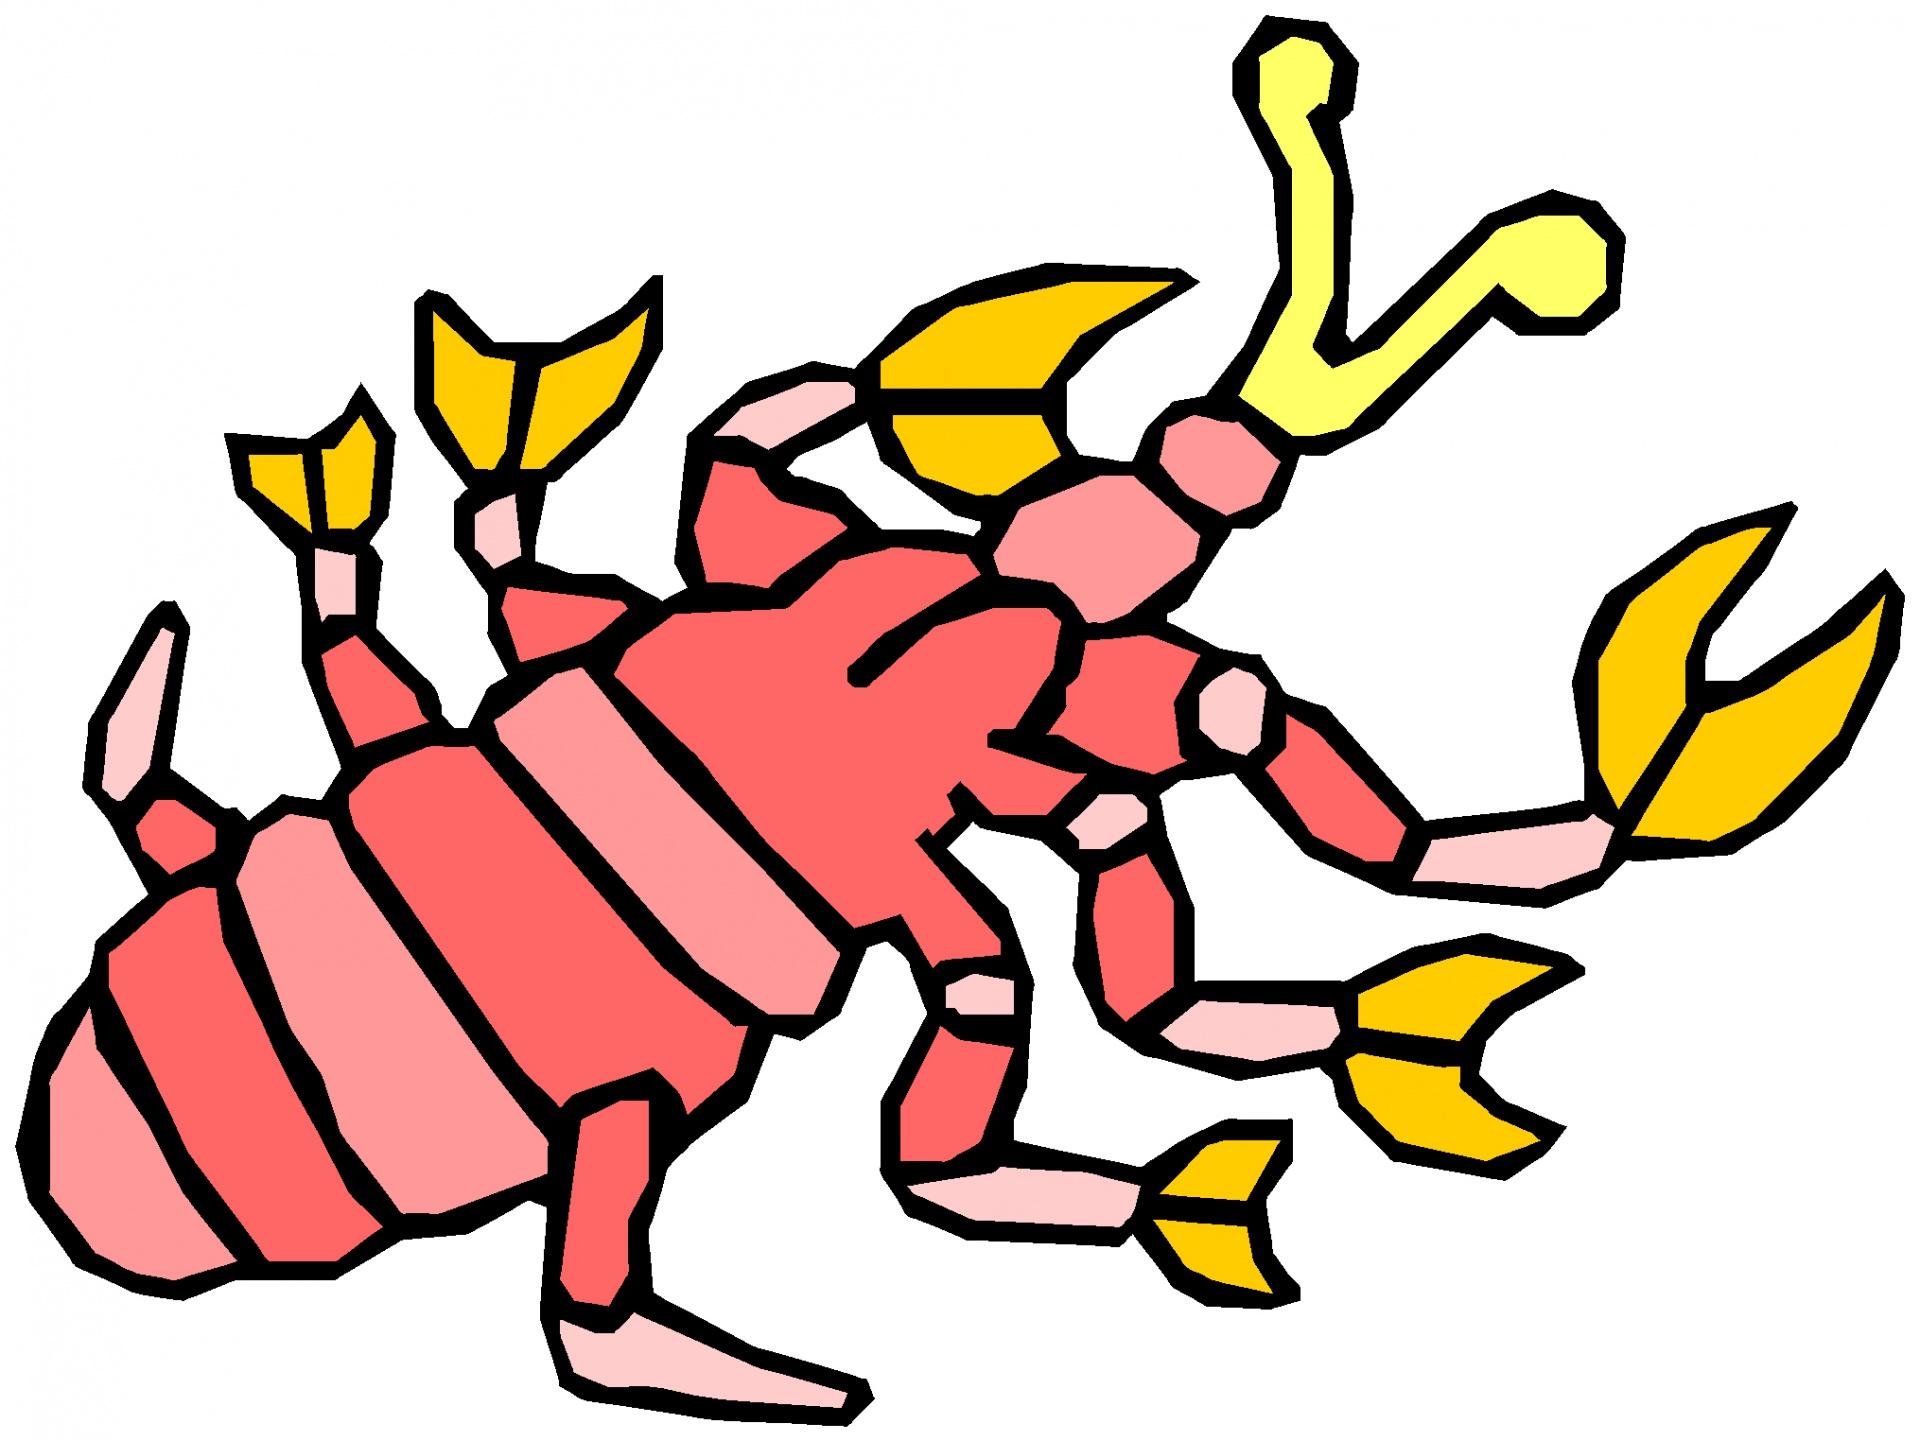 1920x1441 Cute Bug Drawings Funny Big Bash Draw A Life Botanical Barcelona